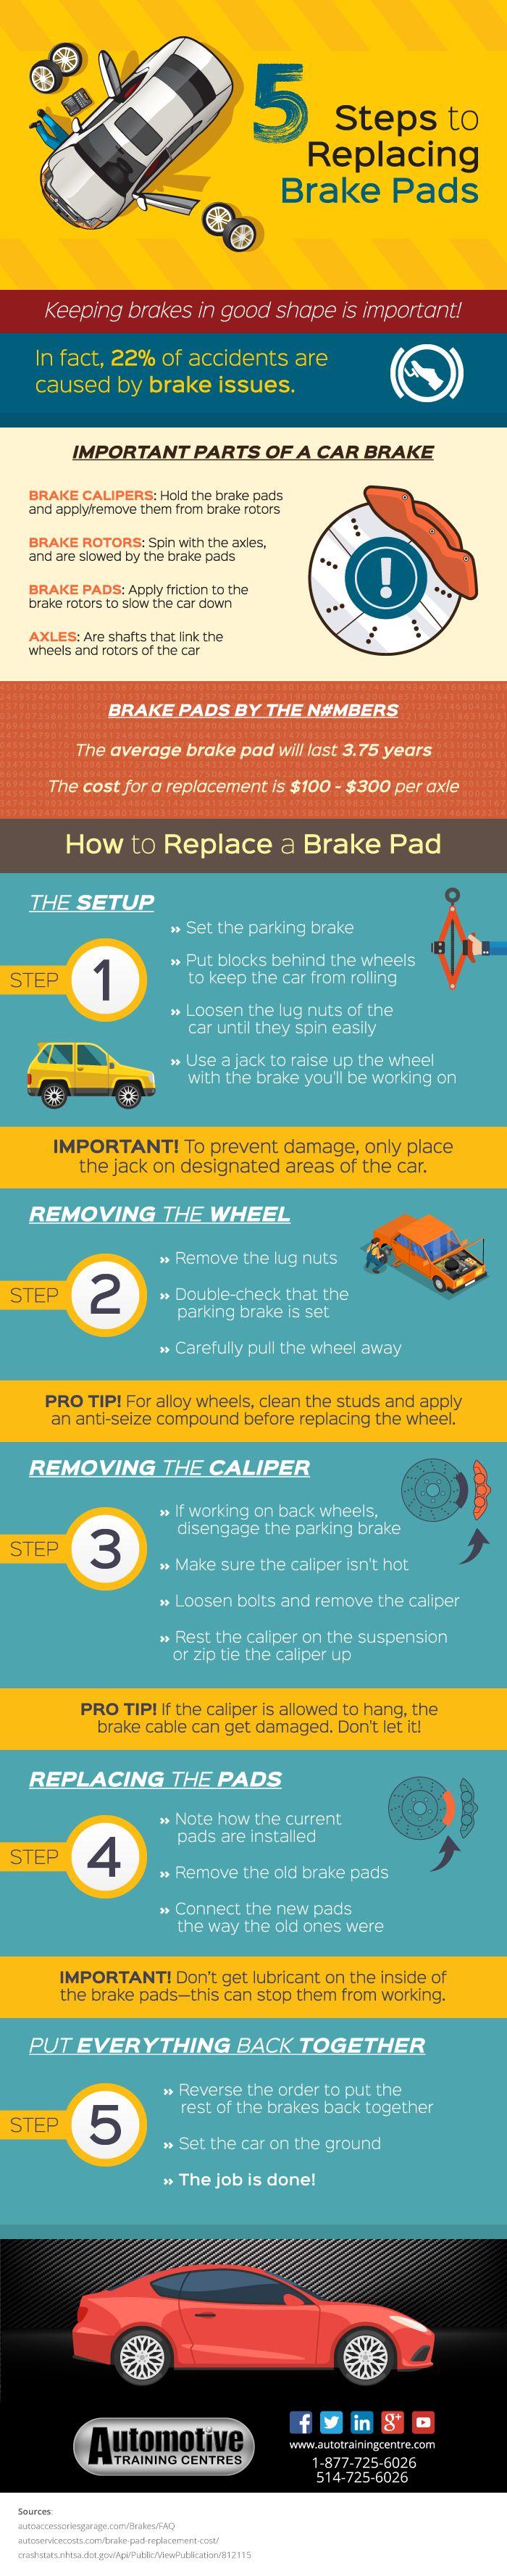 5 steps to replacing brake pads